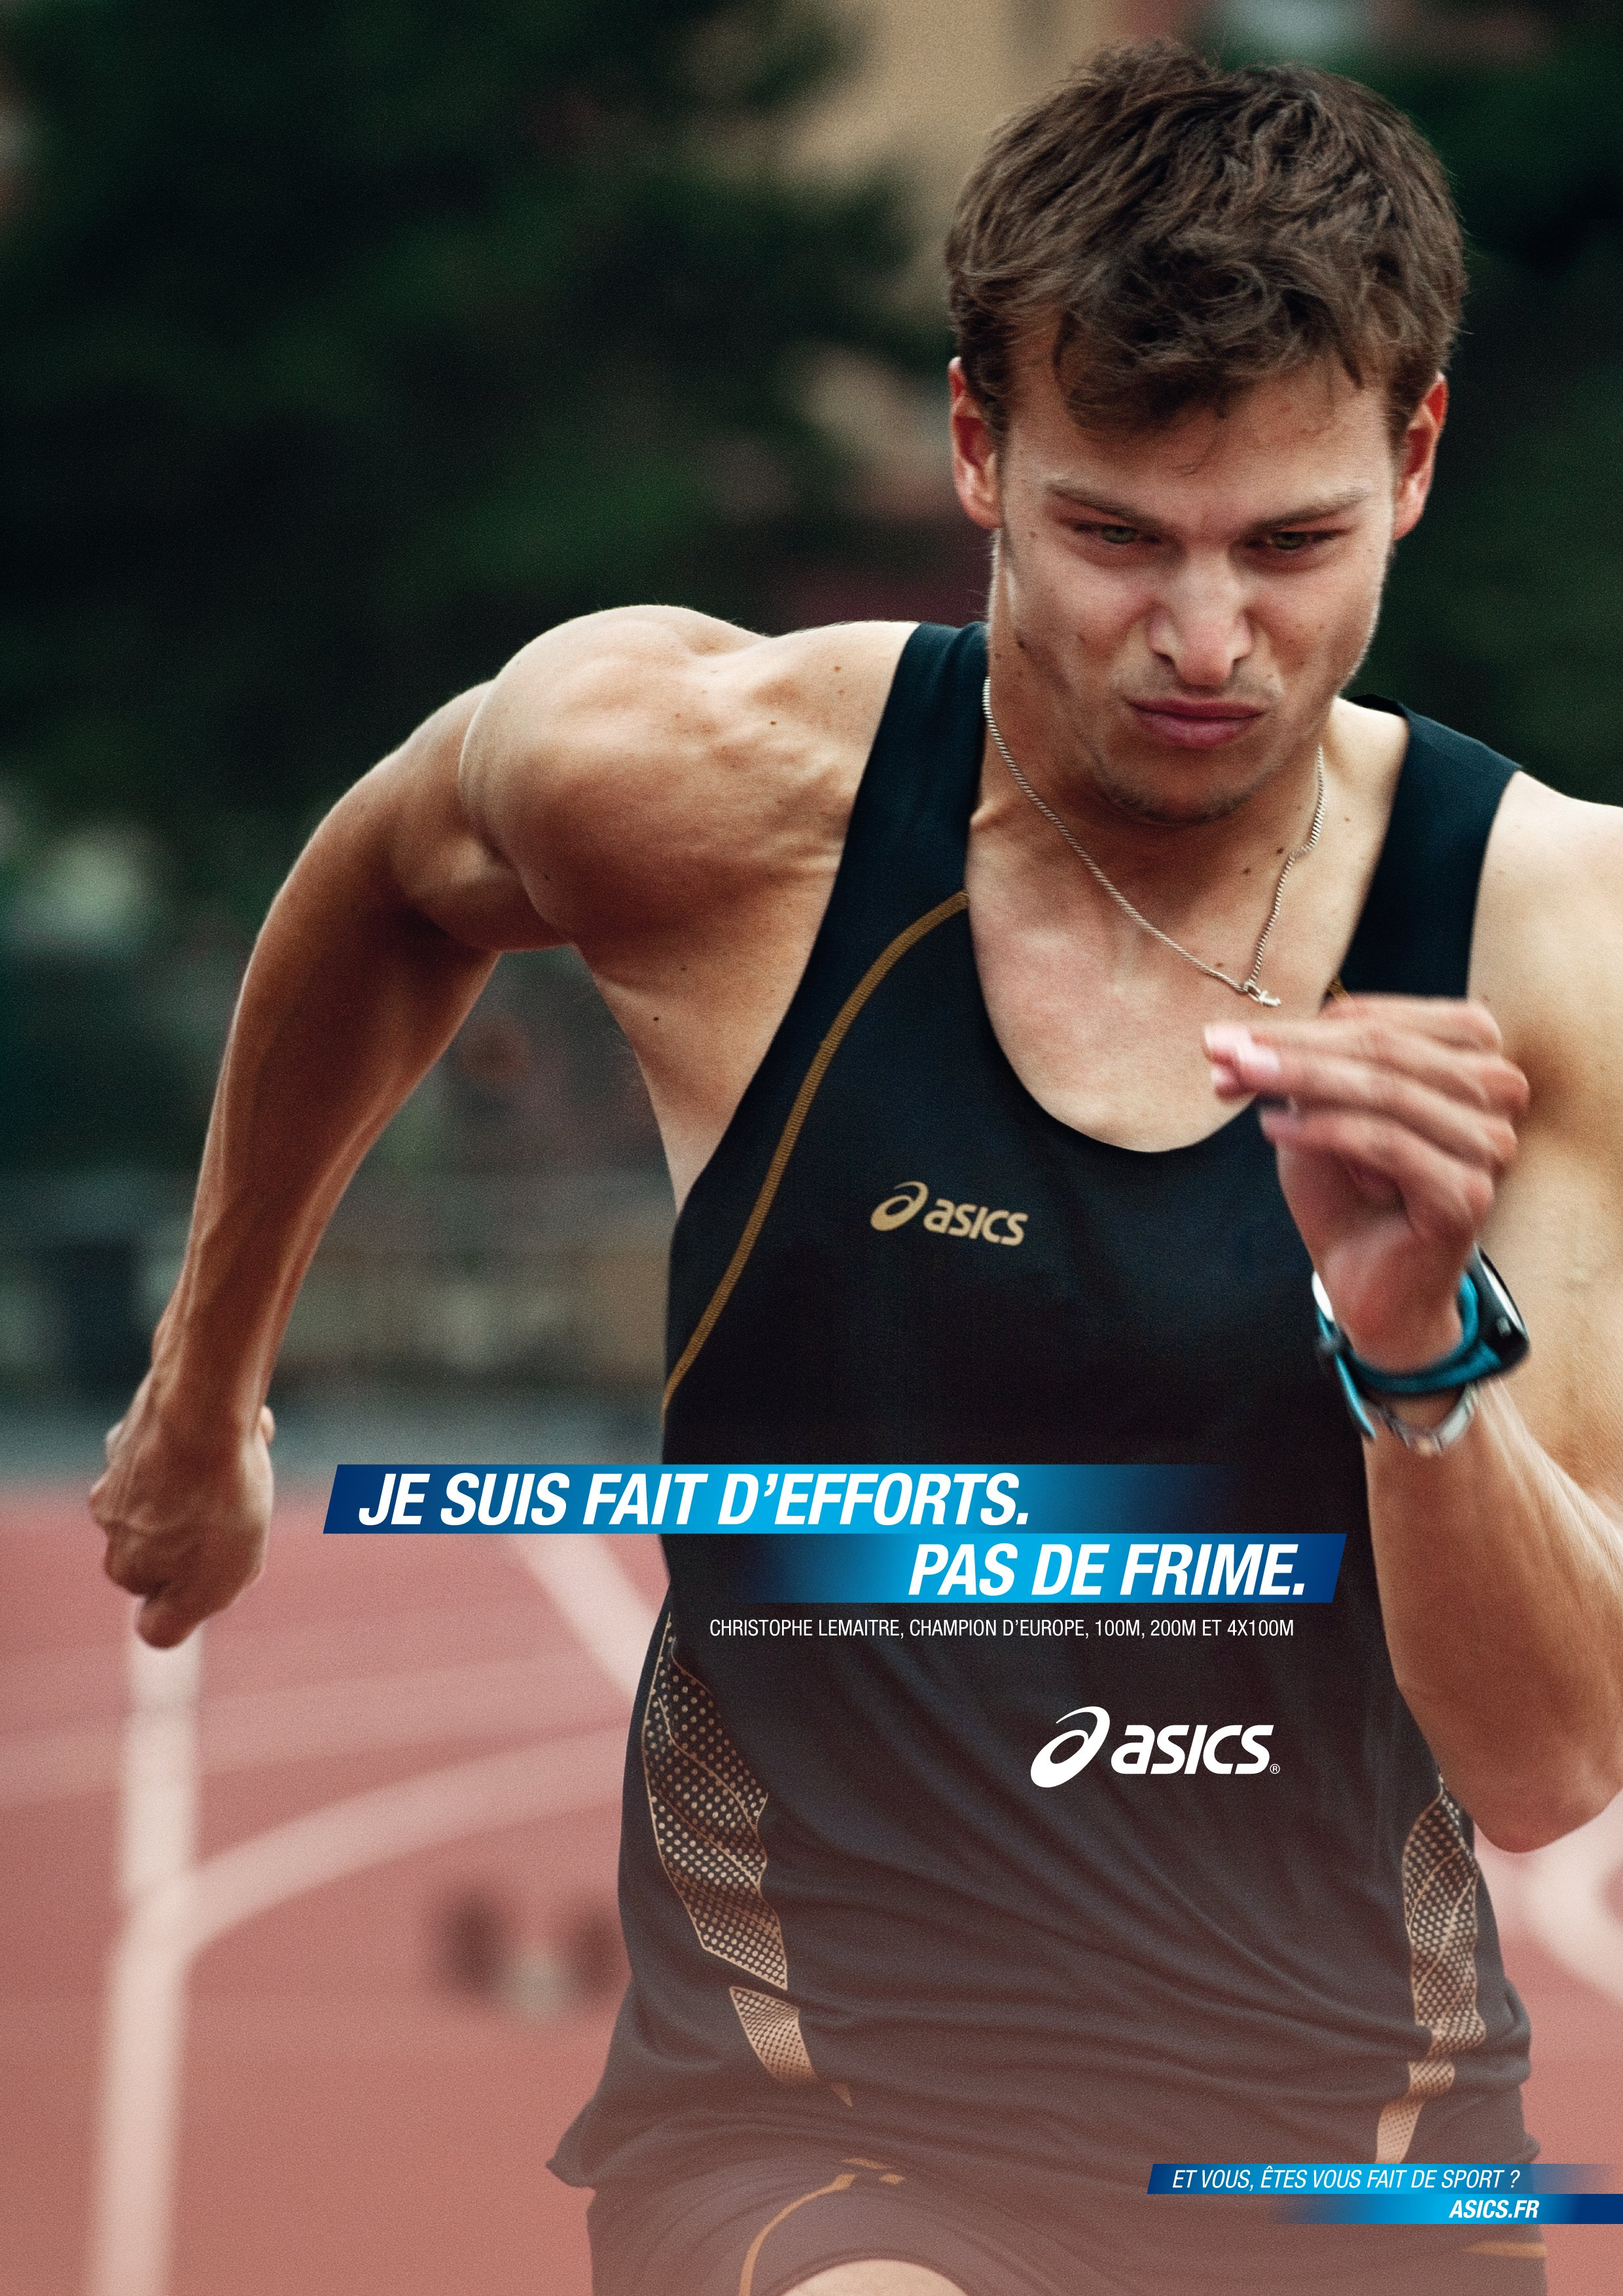 Asics lance sa campagne 2012 made of sport tous en forme la platefor - Made in sport vitrolles ...